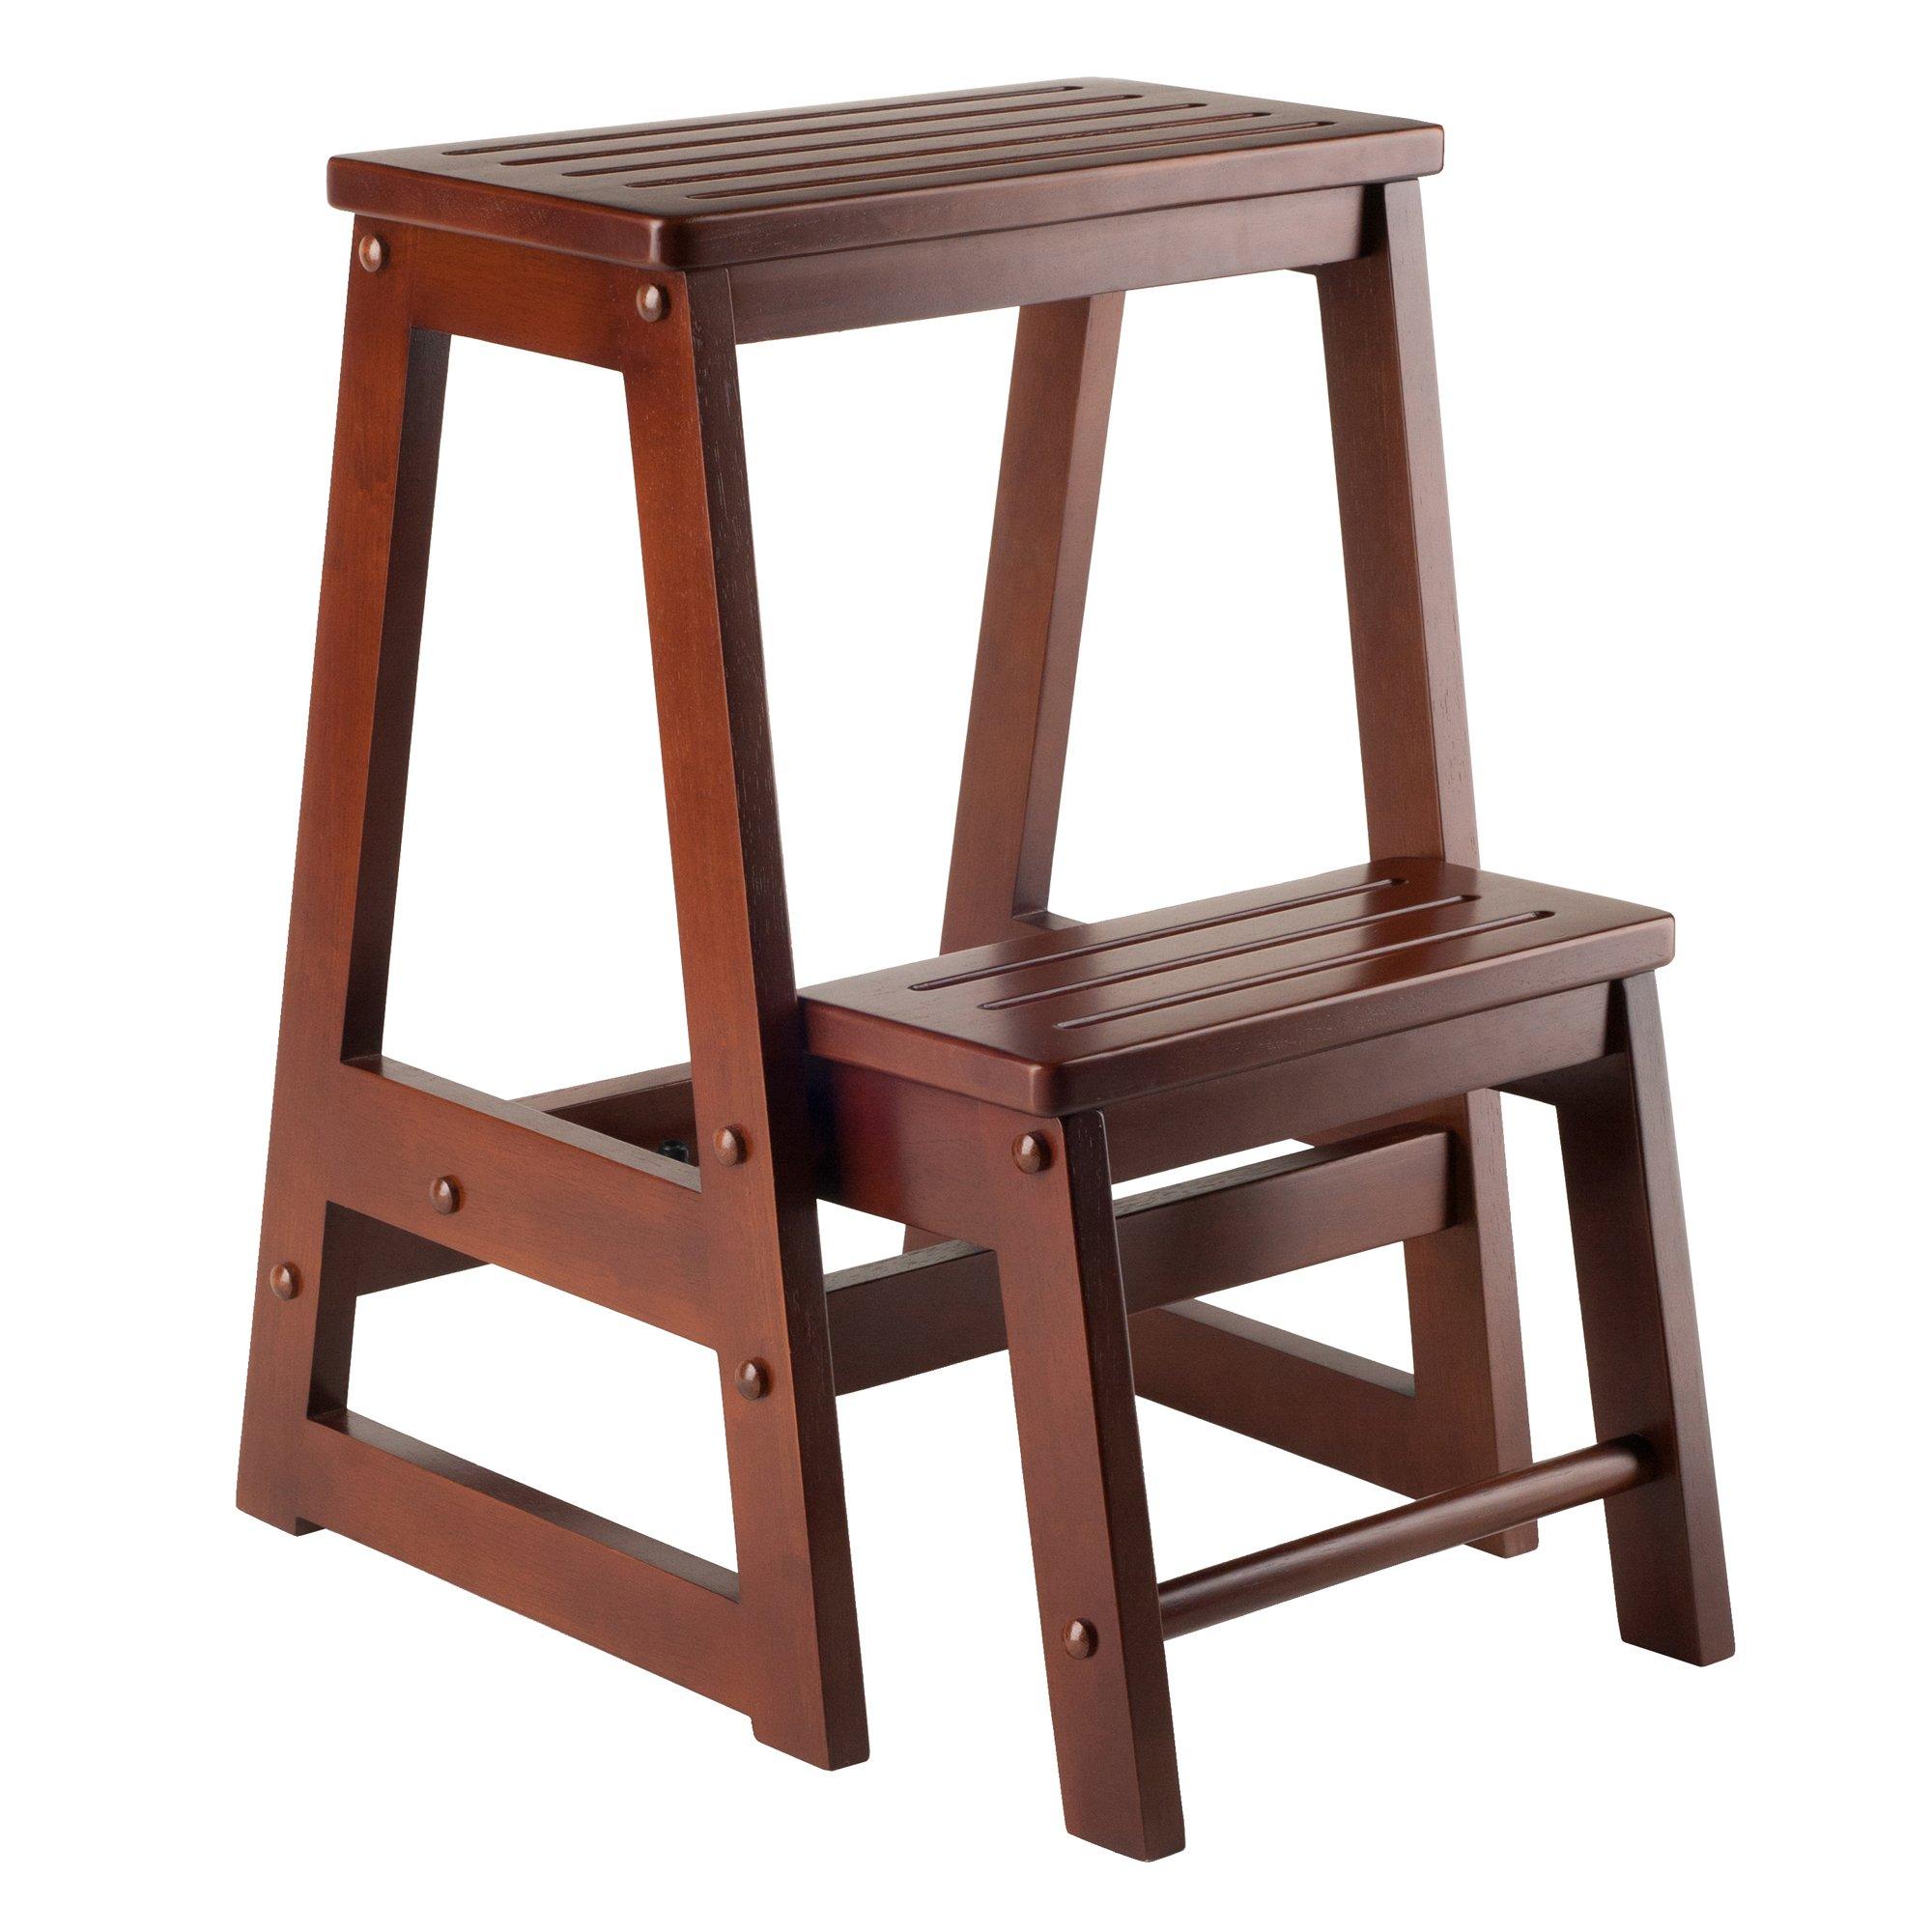 Folding Step Stool Sturdy Portable Closet Wooden Kitchen Ladder Utility 2  Step